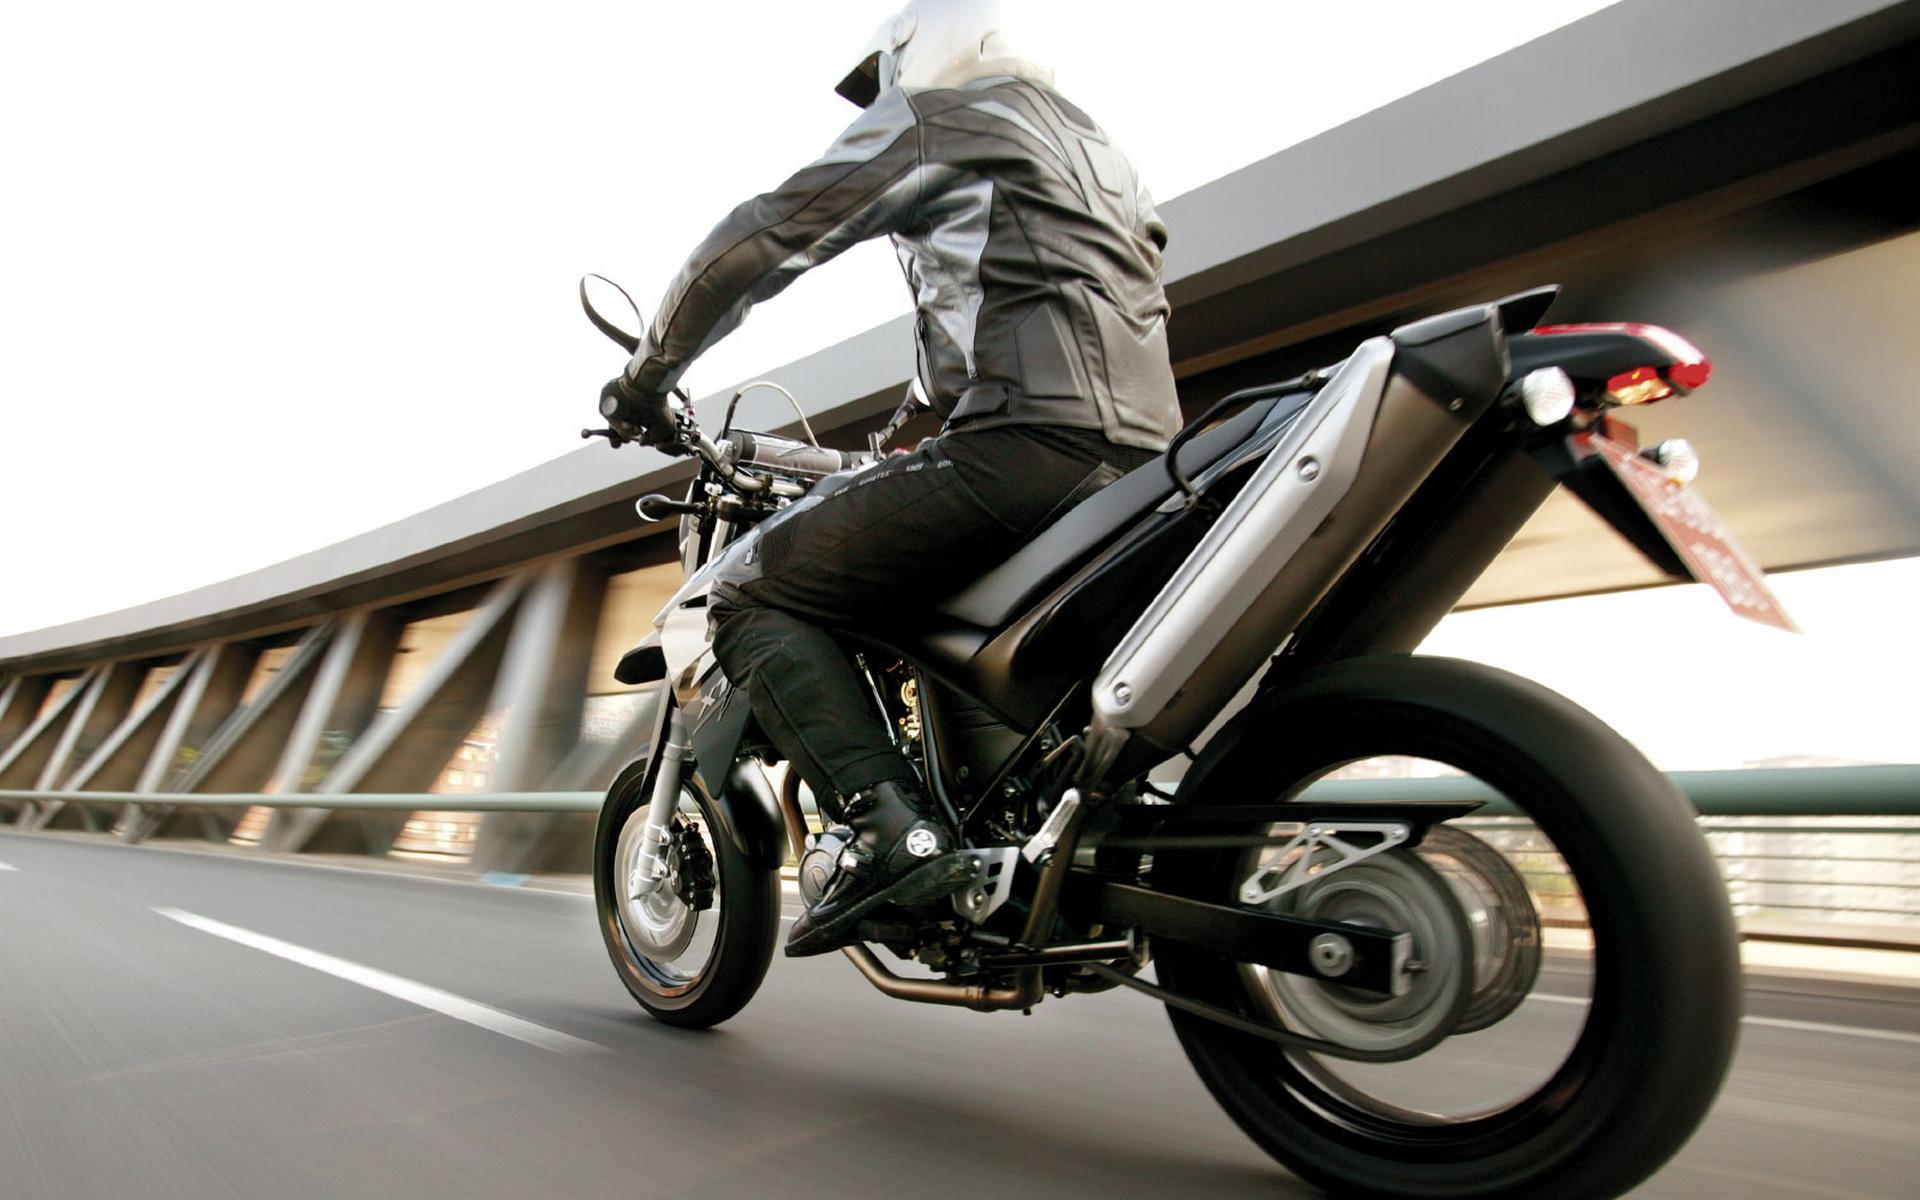 http://www.zastavki.com/pictures/1920x1200/2010/Motocycles_Yamaha_Bikes_Yamaha_XT660X_2004_023658_.jpg